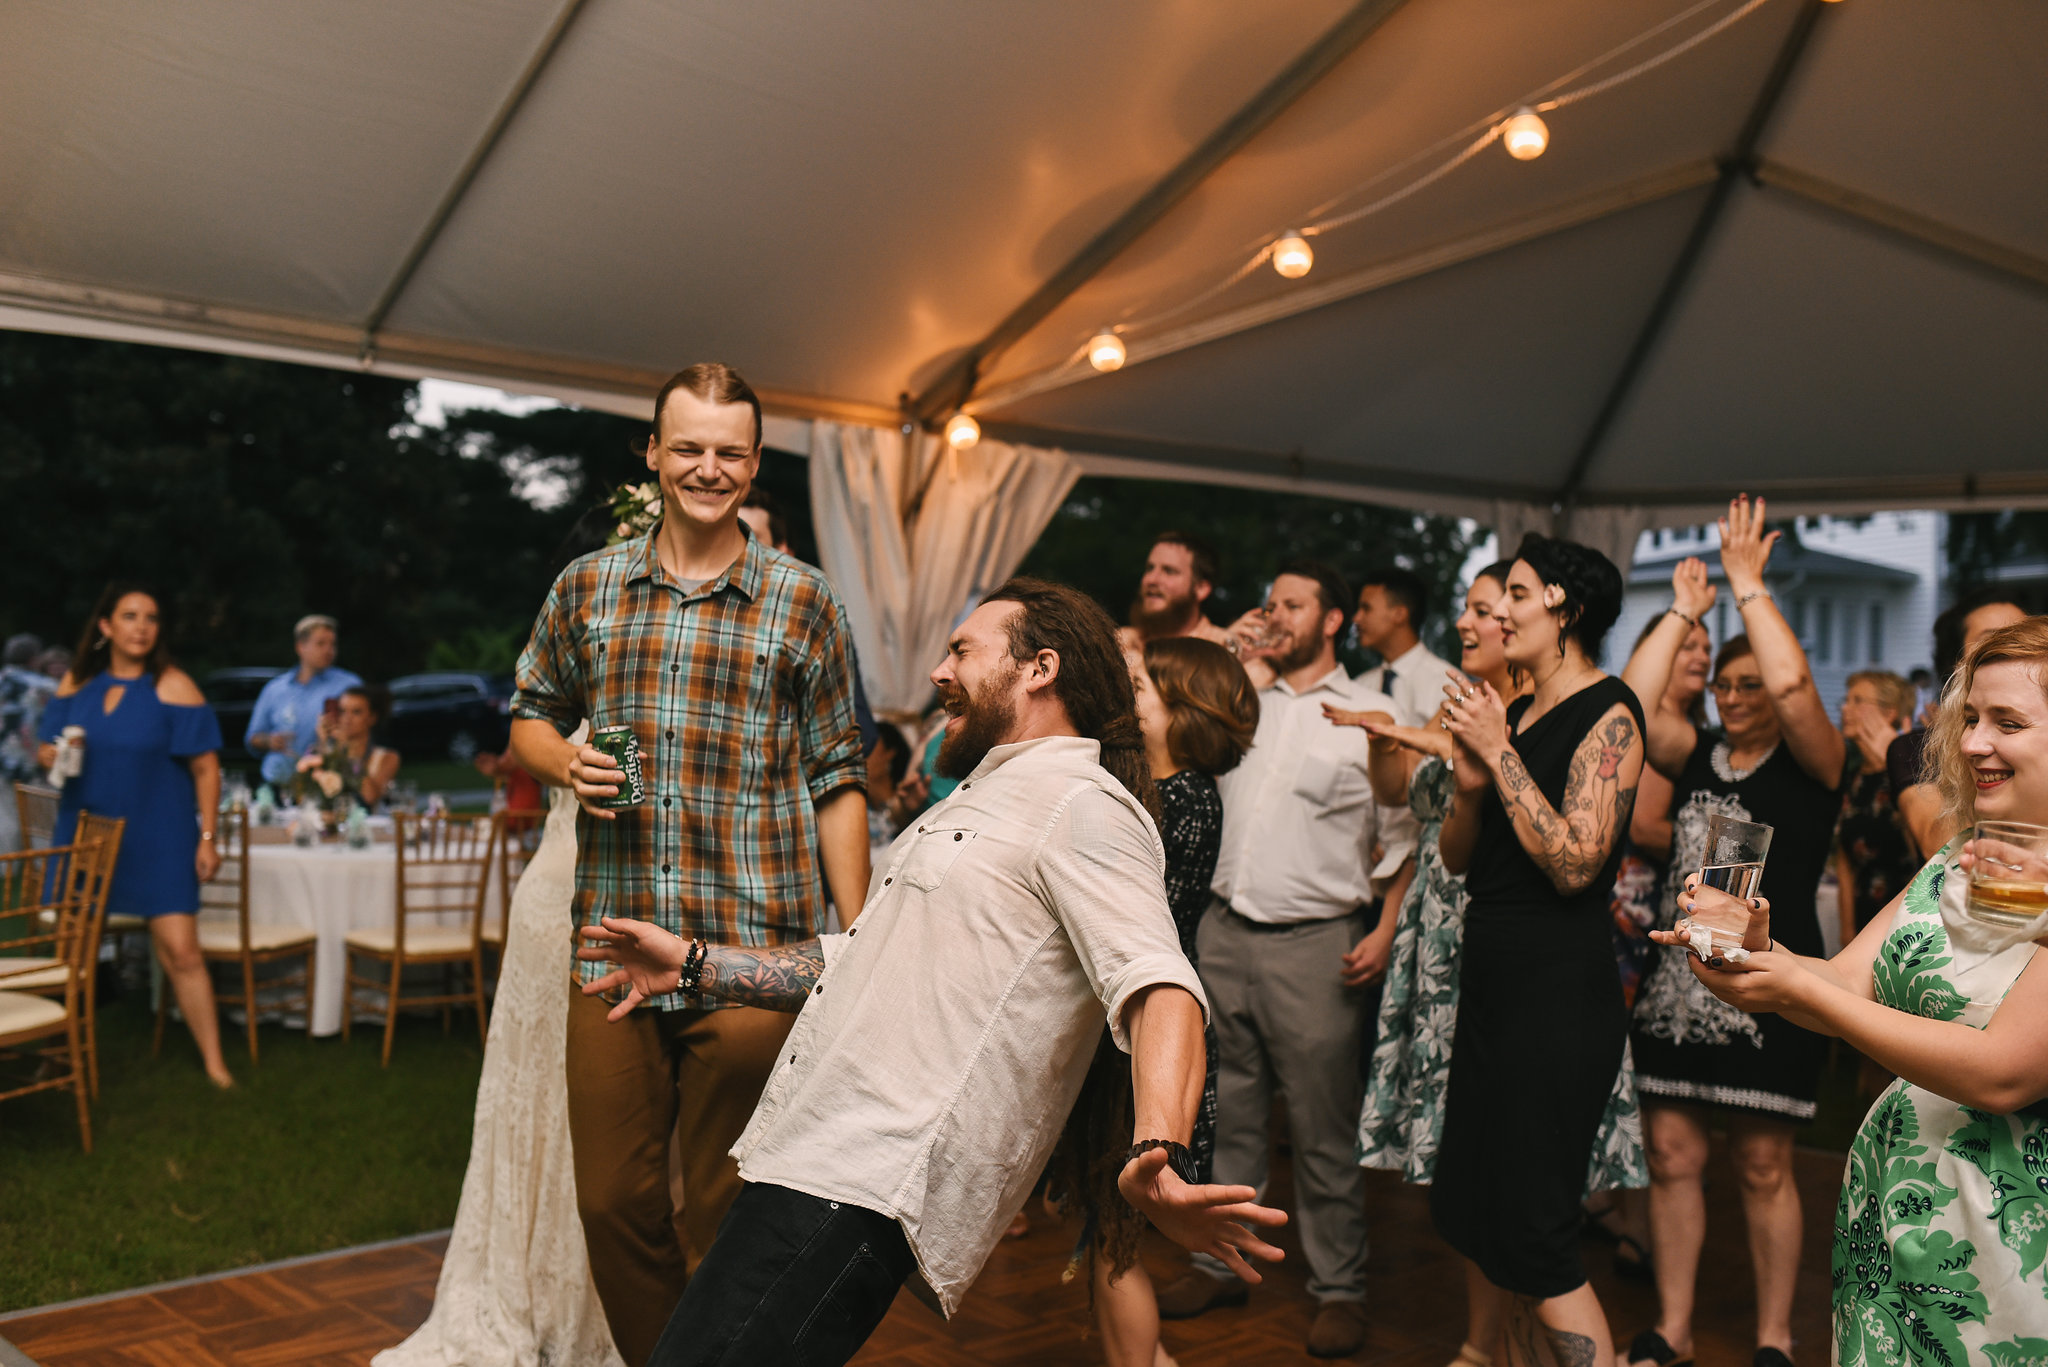 Maryland, Eastern Shore, Baltimore Wedding Photographer, Romantic, Boho, Backyard Wedding, Nature, Fun Photo of Friends Dancing at Reception, Outdoor Reception